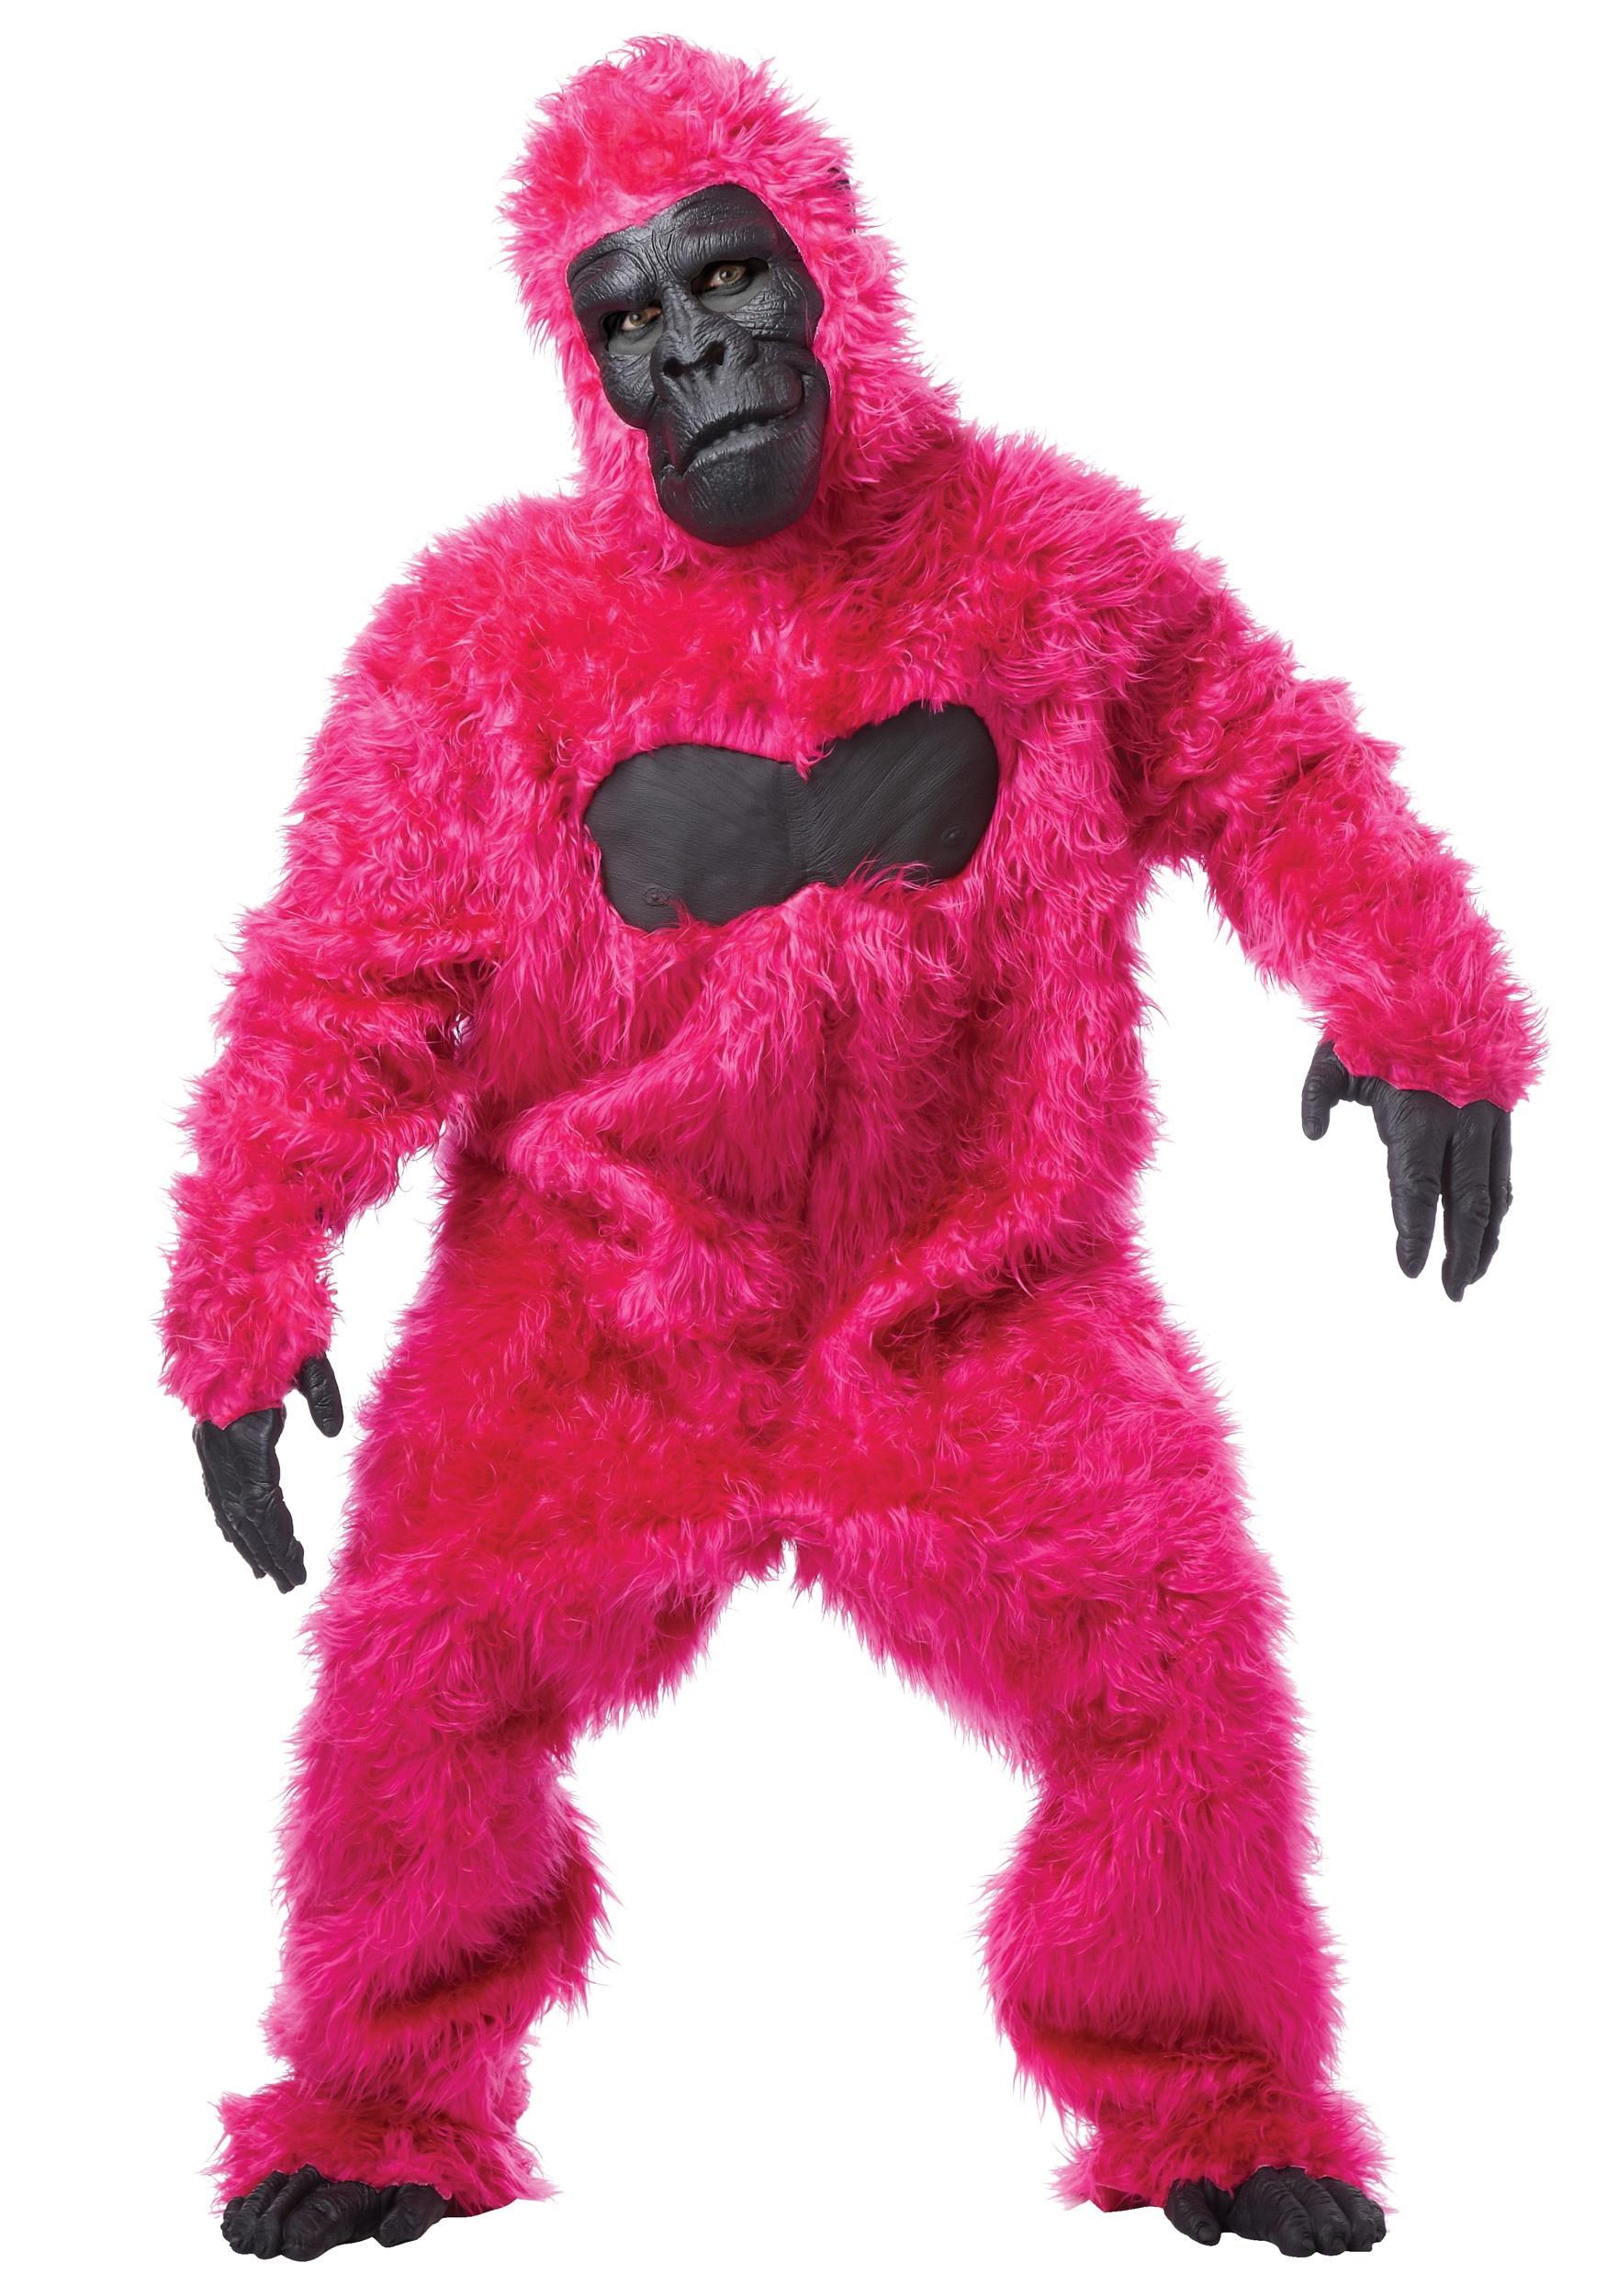 Deluxe Gorilla Suit Costume Adult Jungle Monkey Animal Halloween Fancy Dress